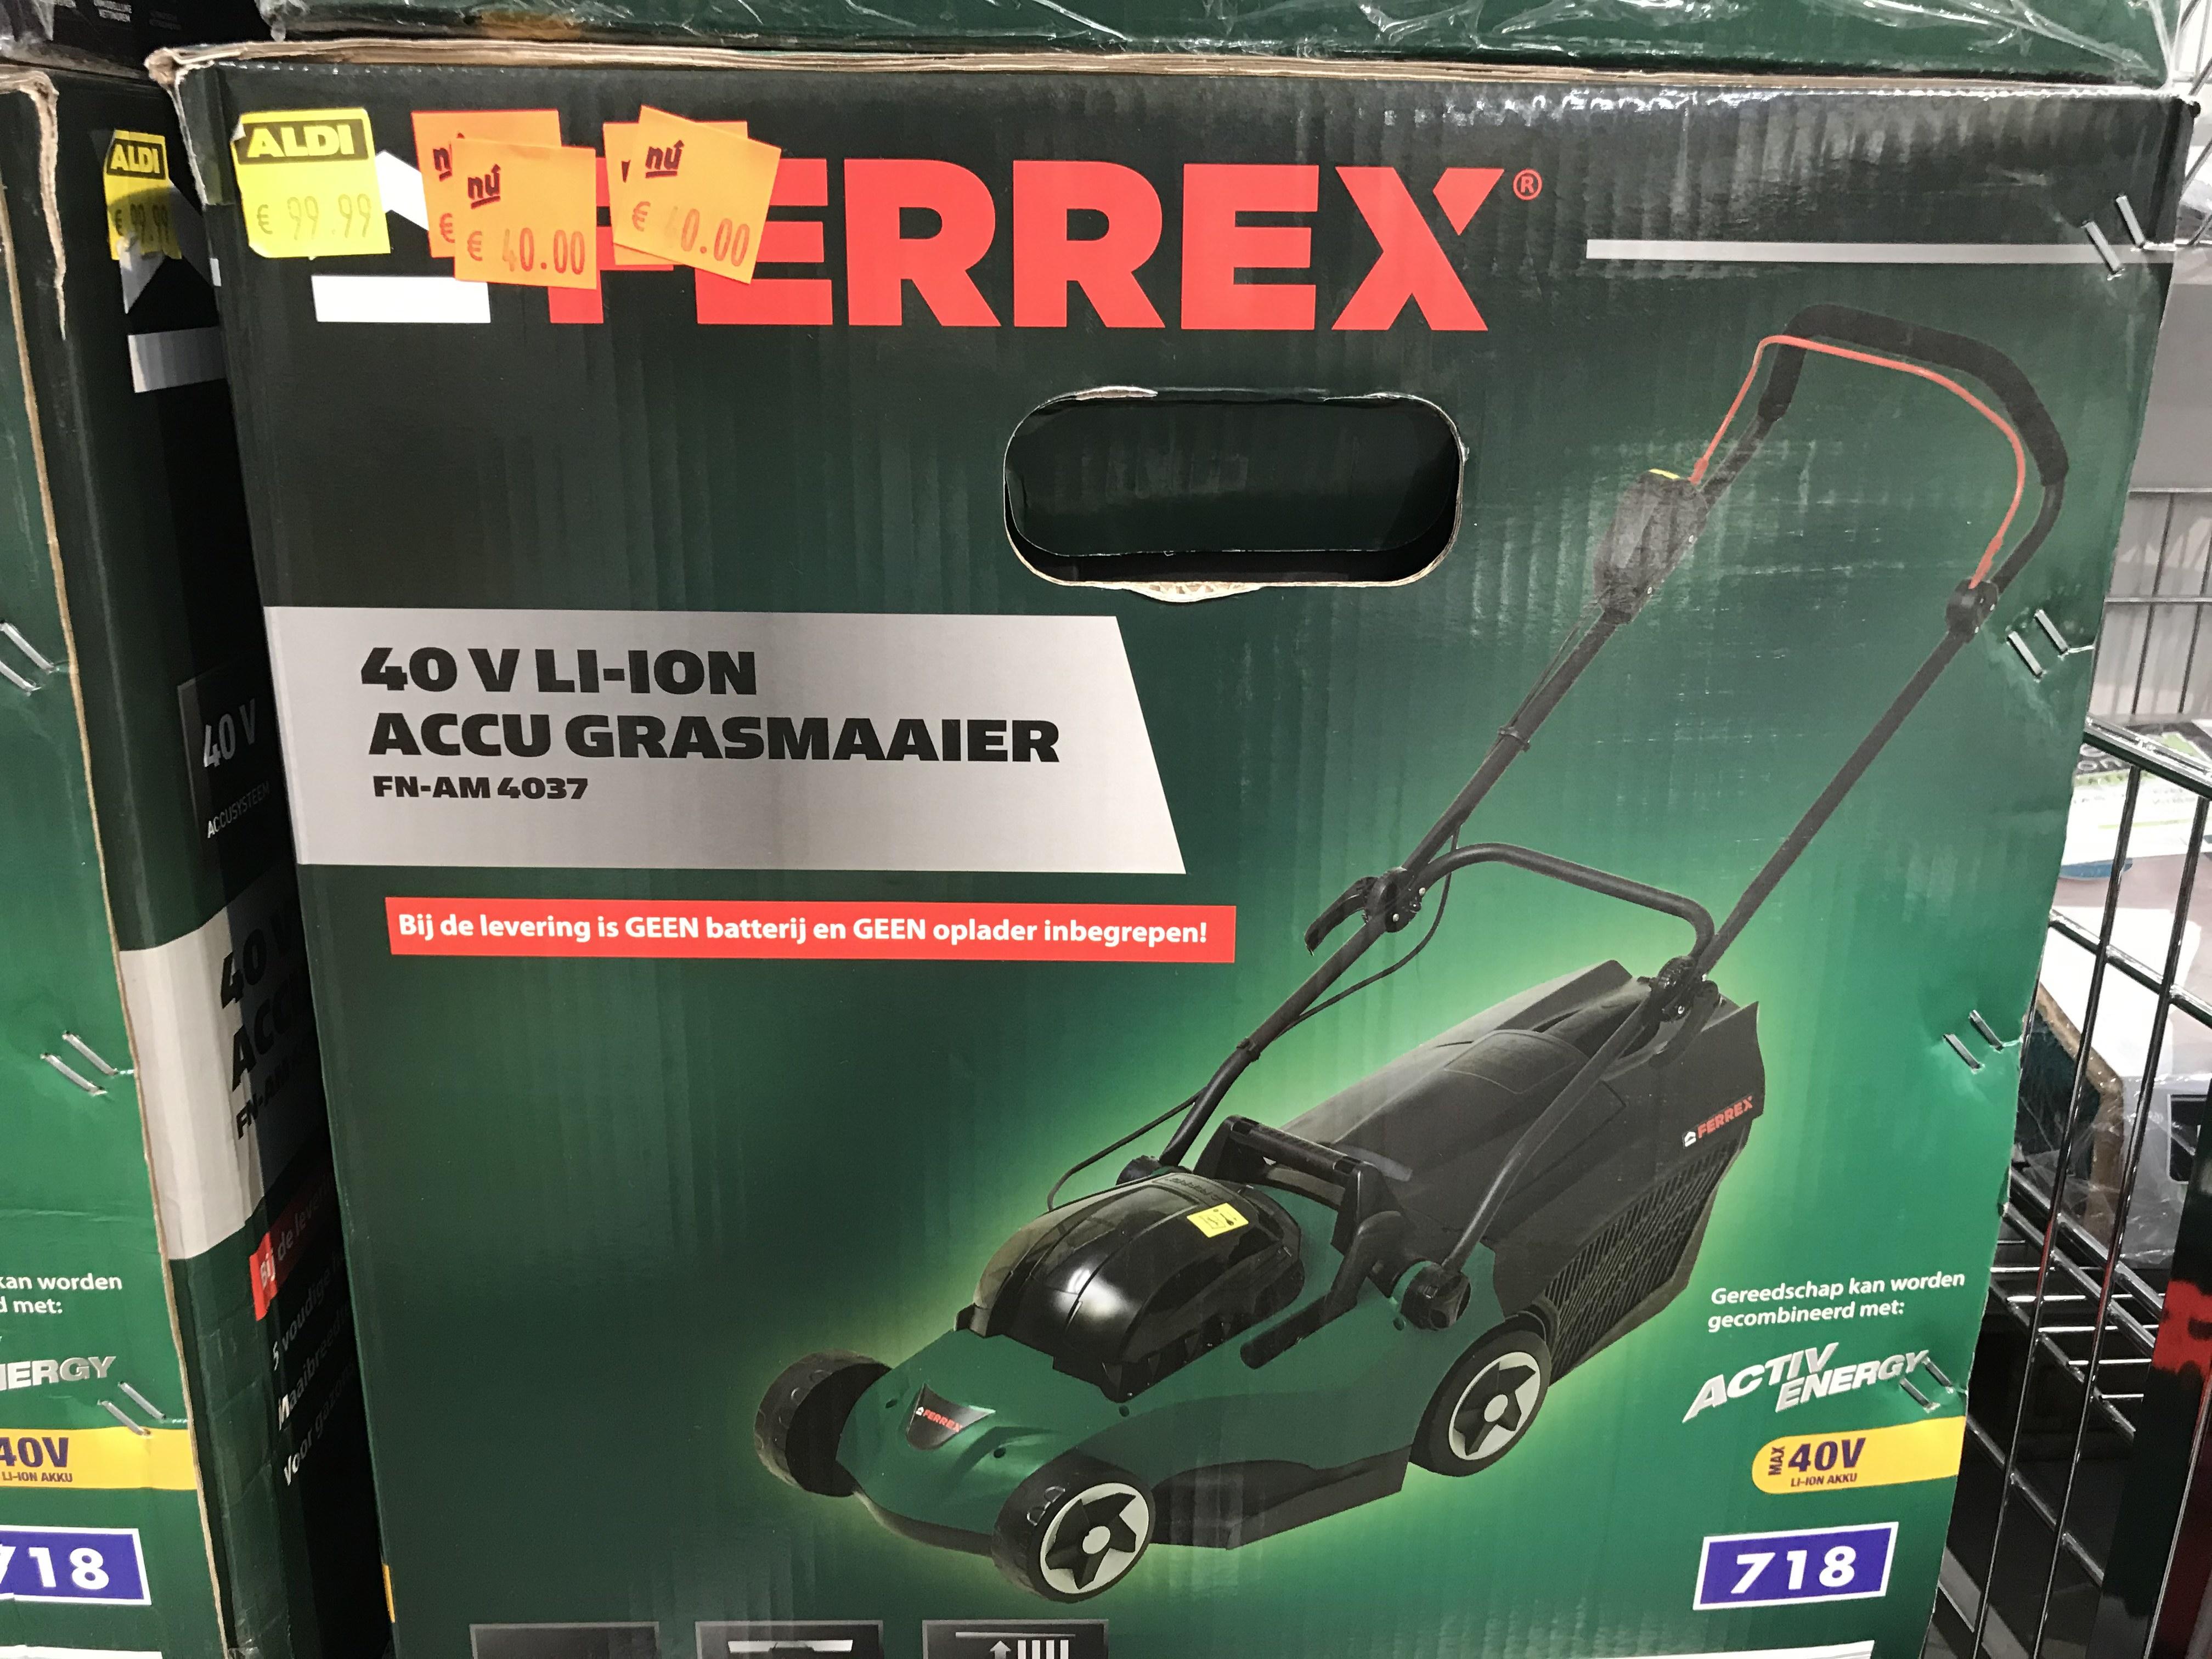 Ferrex 40V LI-ION accugrasmaaier (zonder accu)